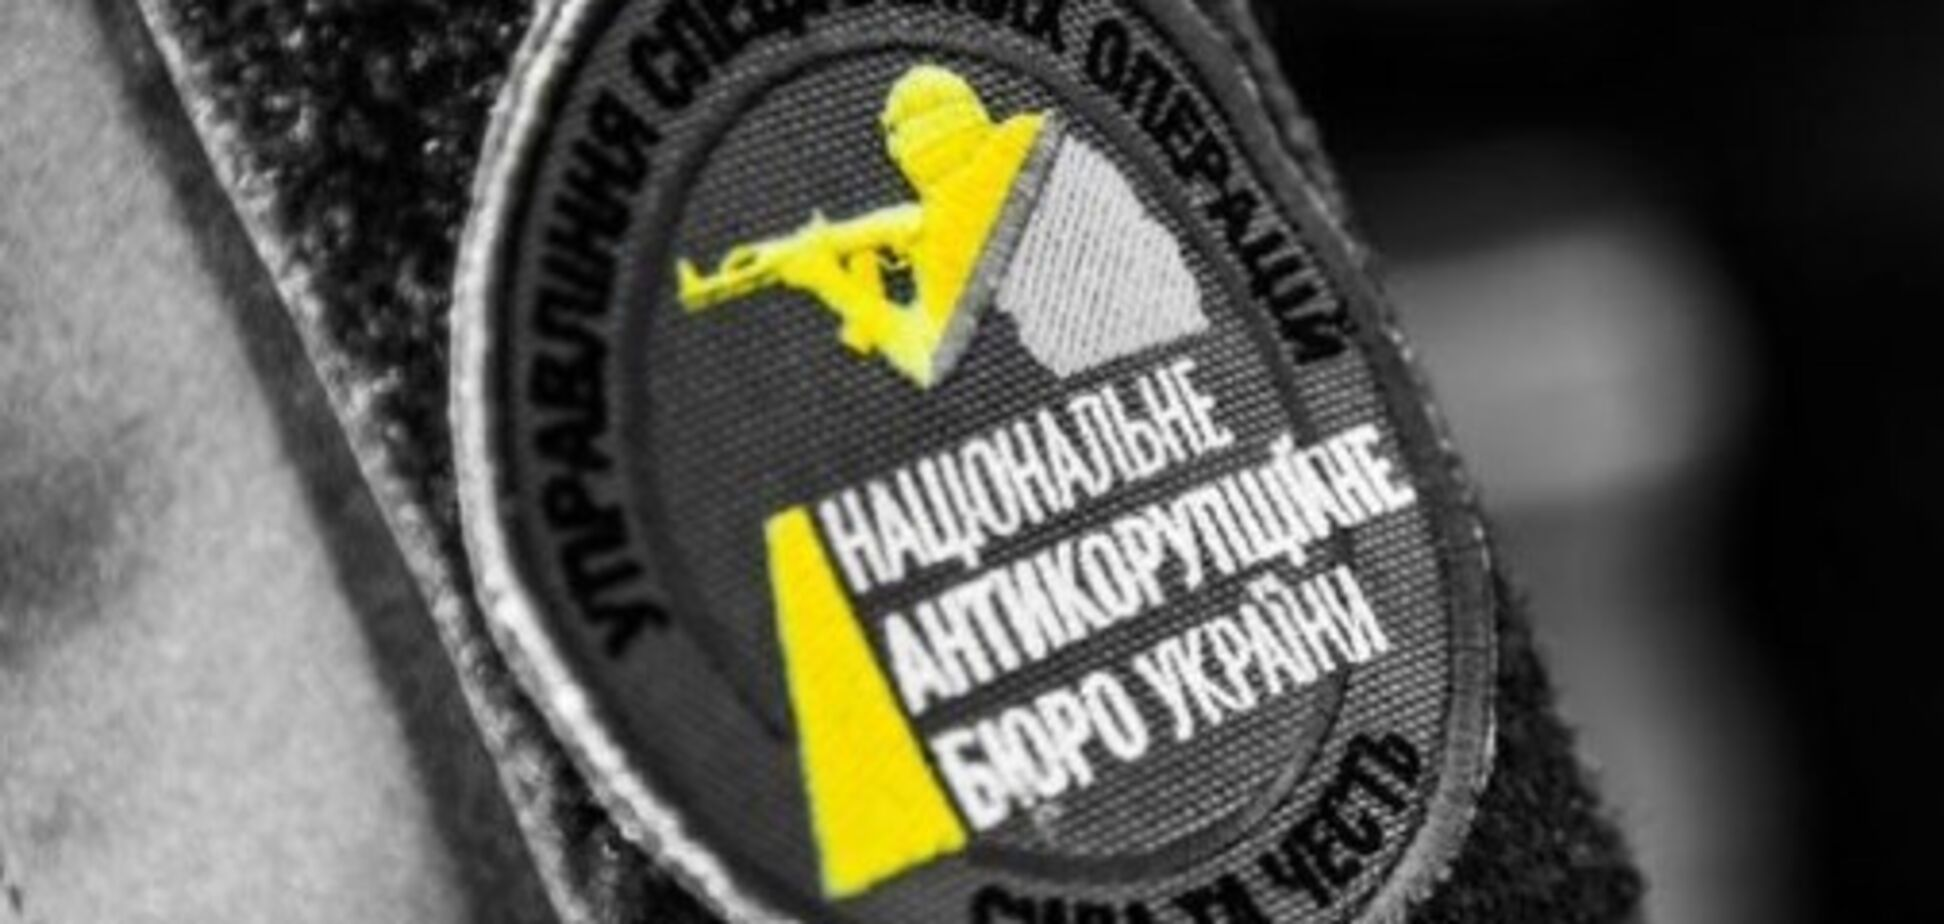 НАБУ заказало ''слежку'' за соцсетями и СМИ